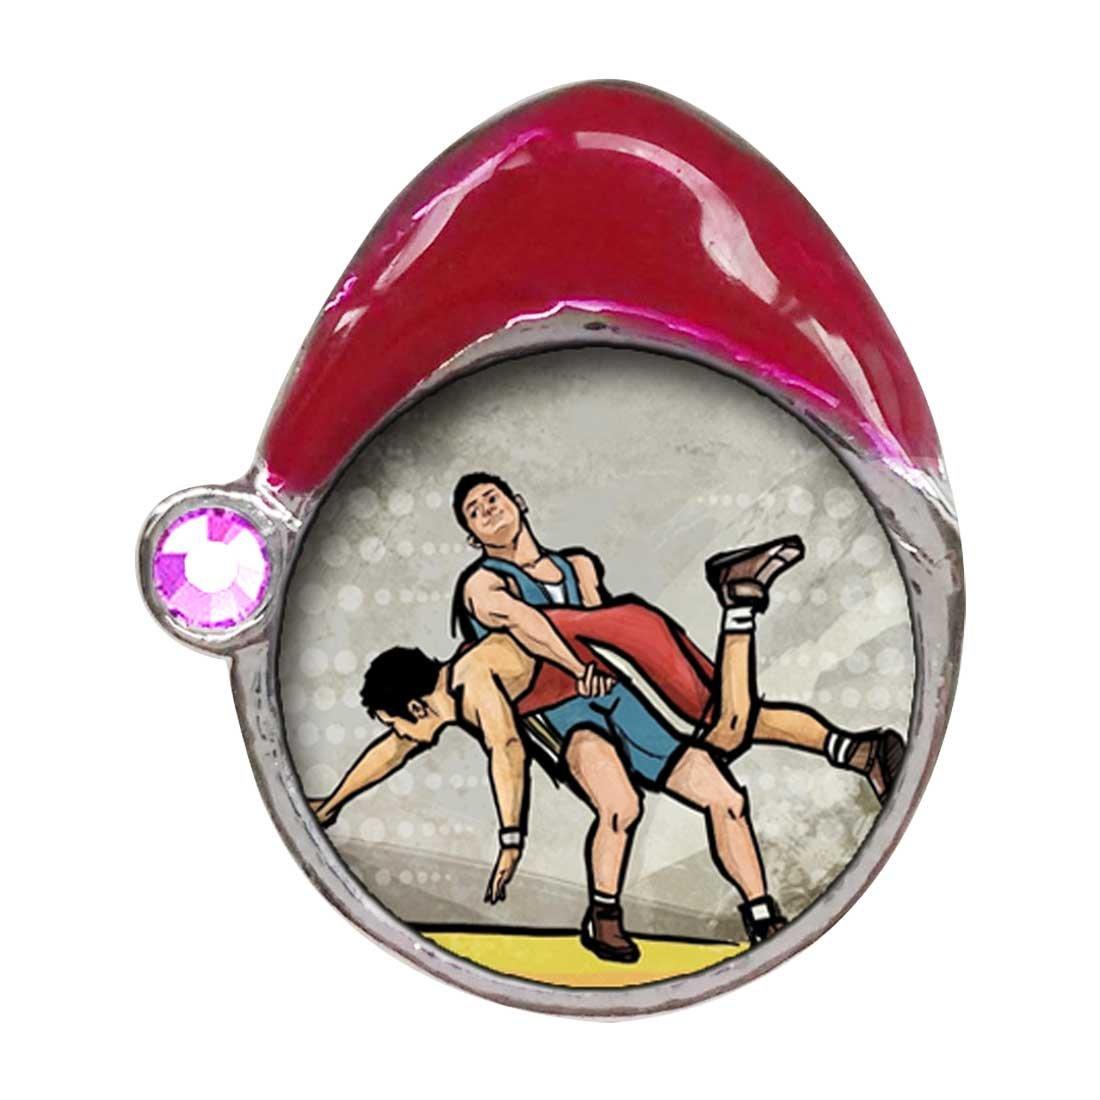 Olympics Wrestling Light Amethyst Crystal June Birthstone Red Santa Hat Charm Bracelets